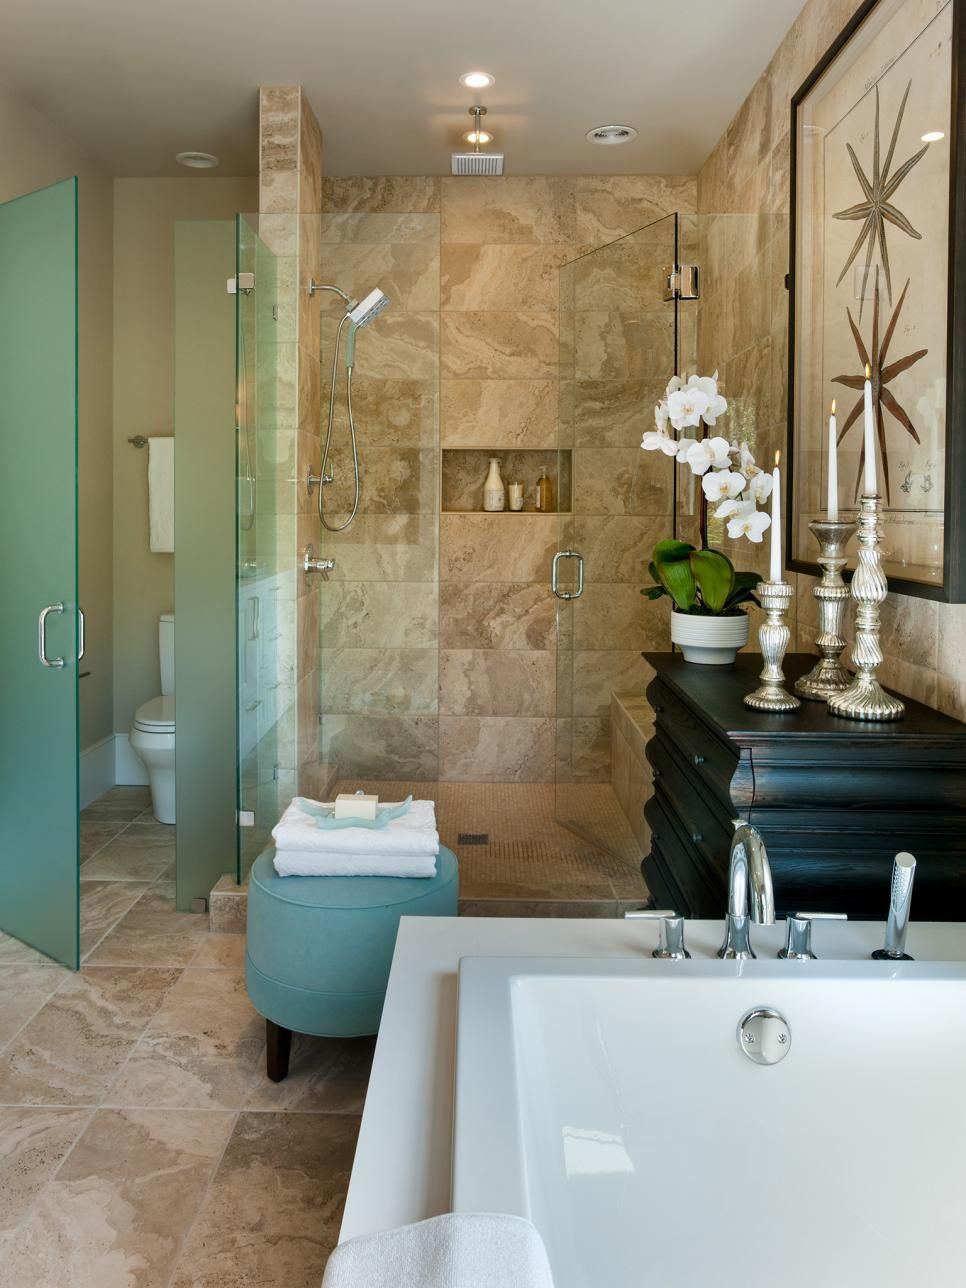 Master bedroom bathroom layout  Dream Home  Master Bathroom  Porcelain tile Travertine and